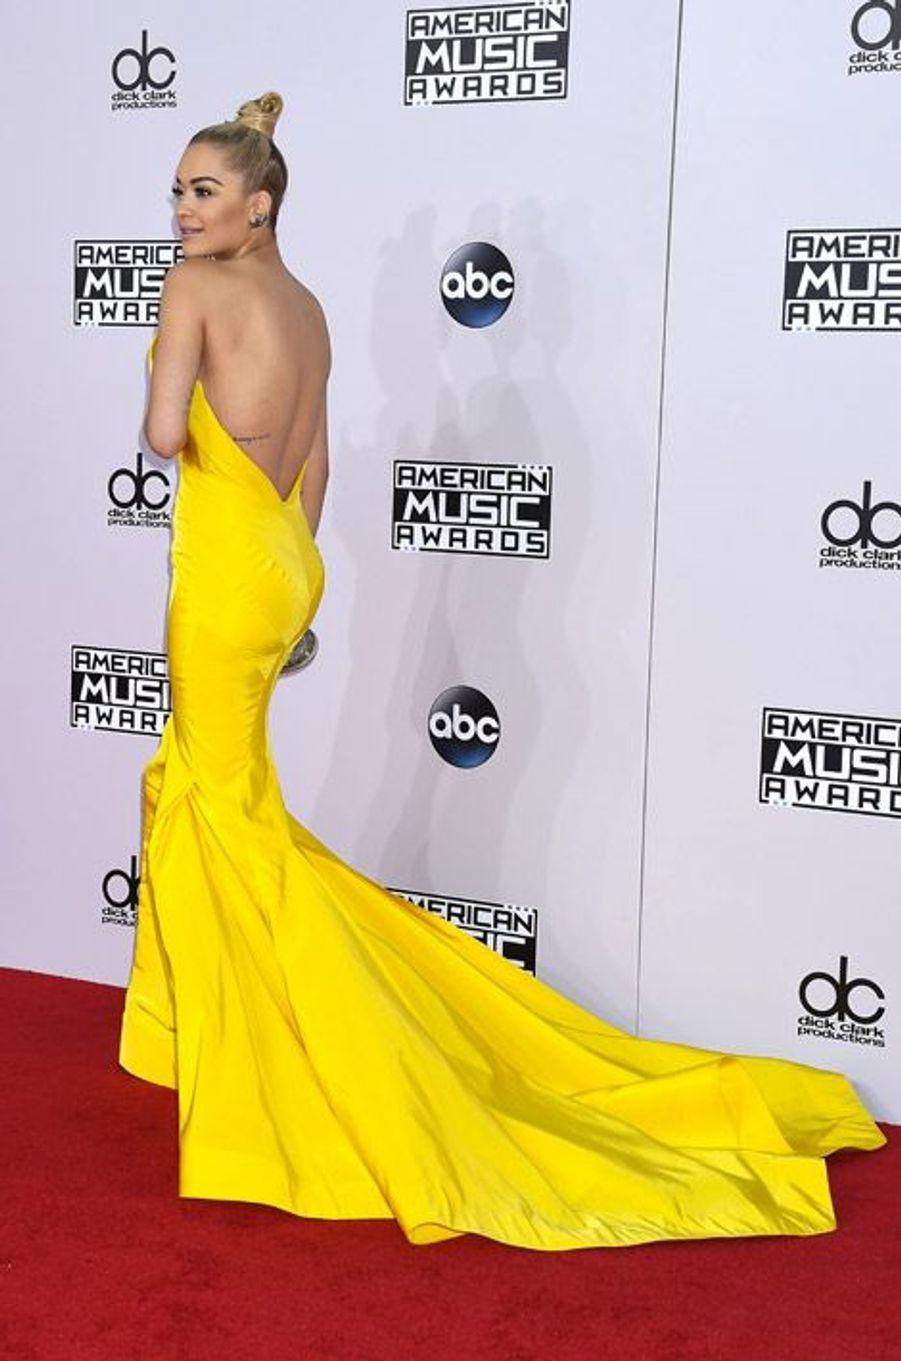 La chanteuse Rita Ora en Zac Posen lors de la cérémonie des American Music Awards à Los Angeles, le 23 novembre 2014